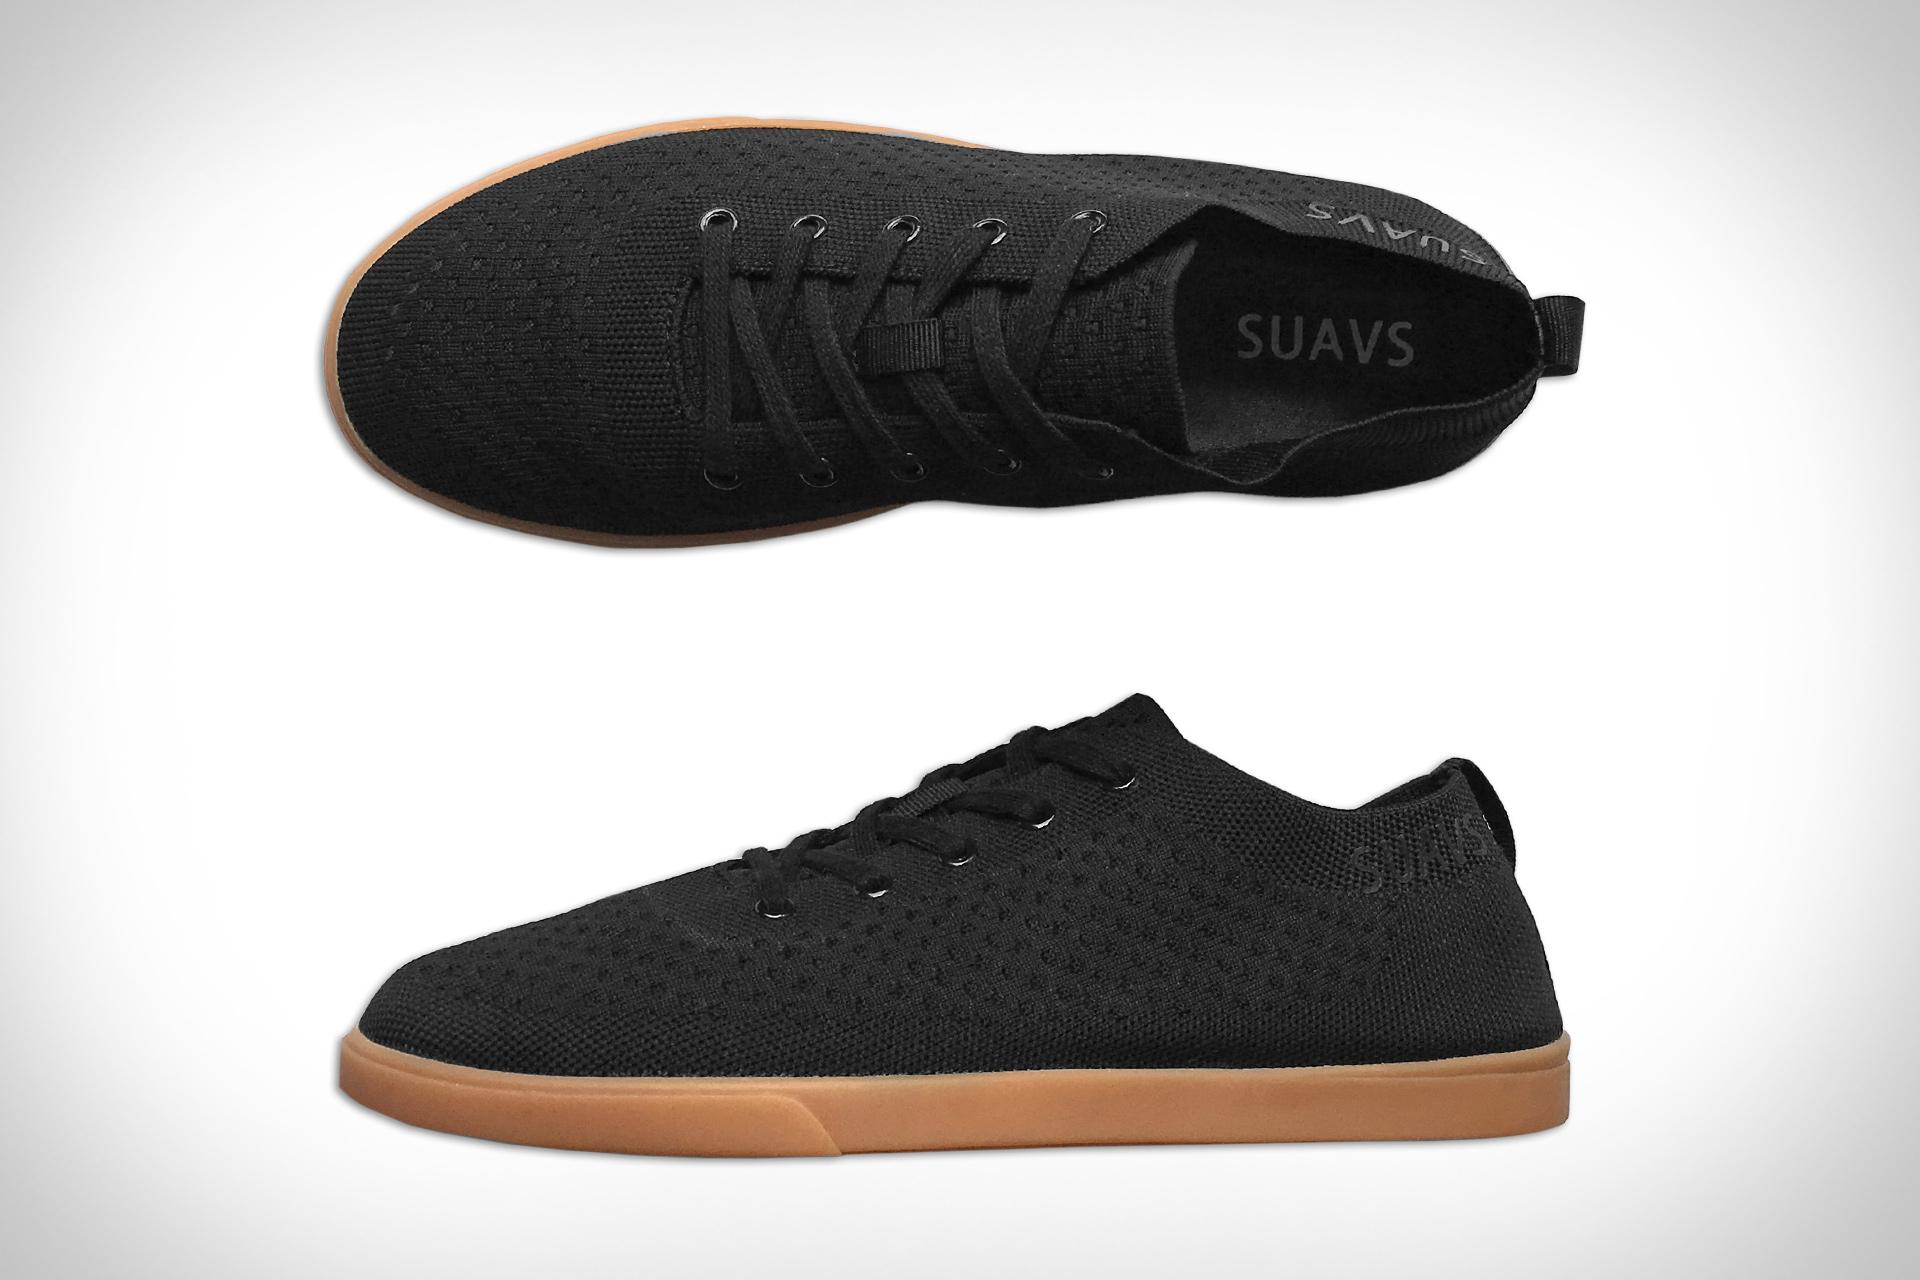 Suavs Zilker Shoe